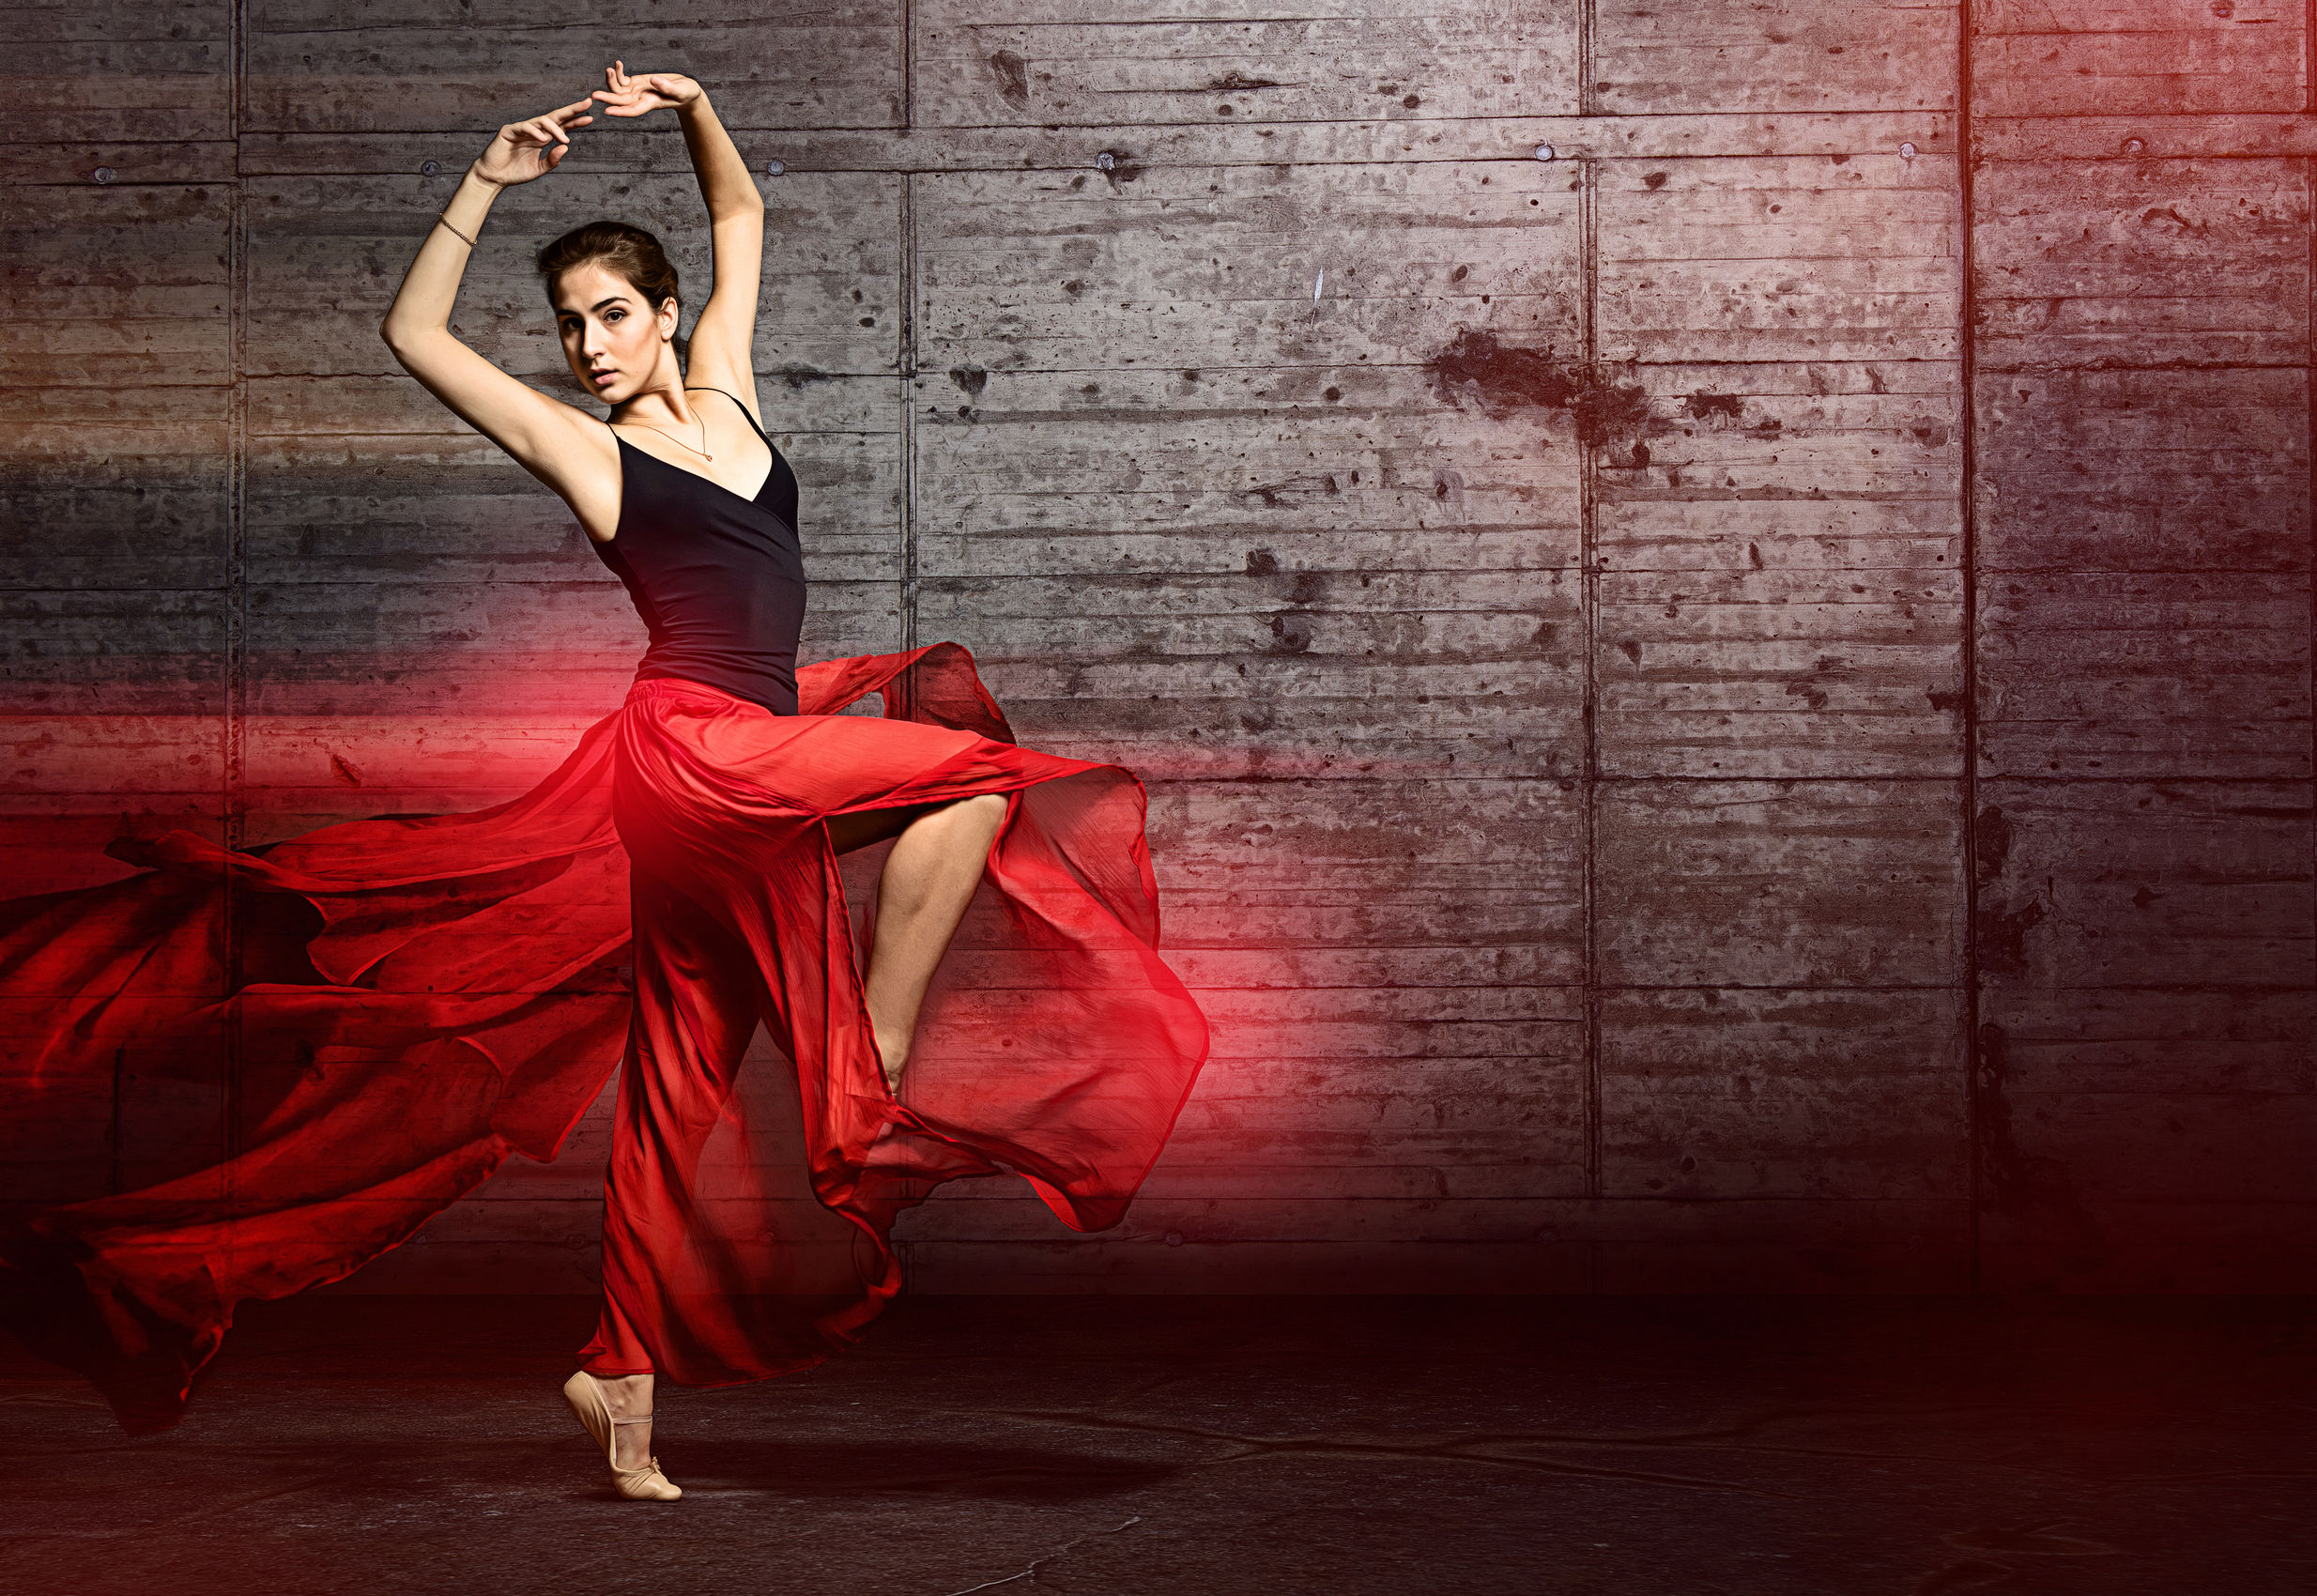 dance as a tool for assertiveness